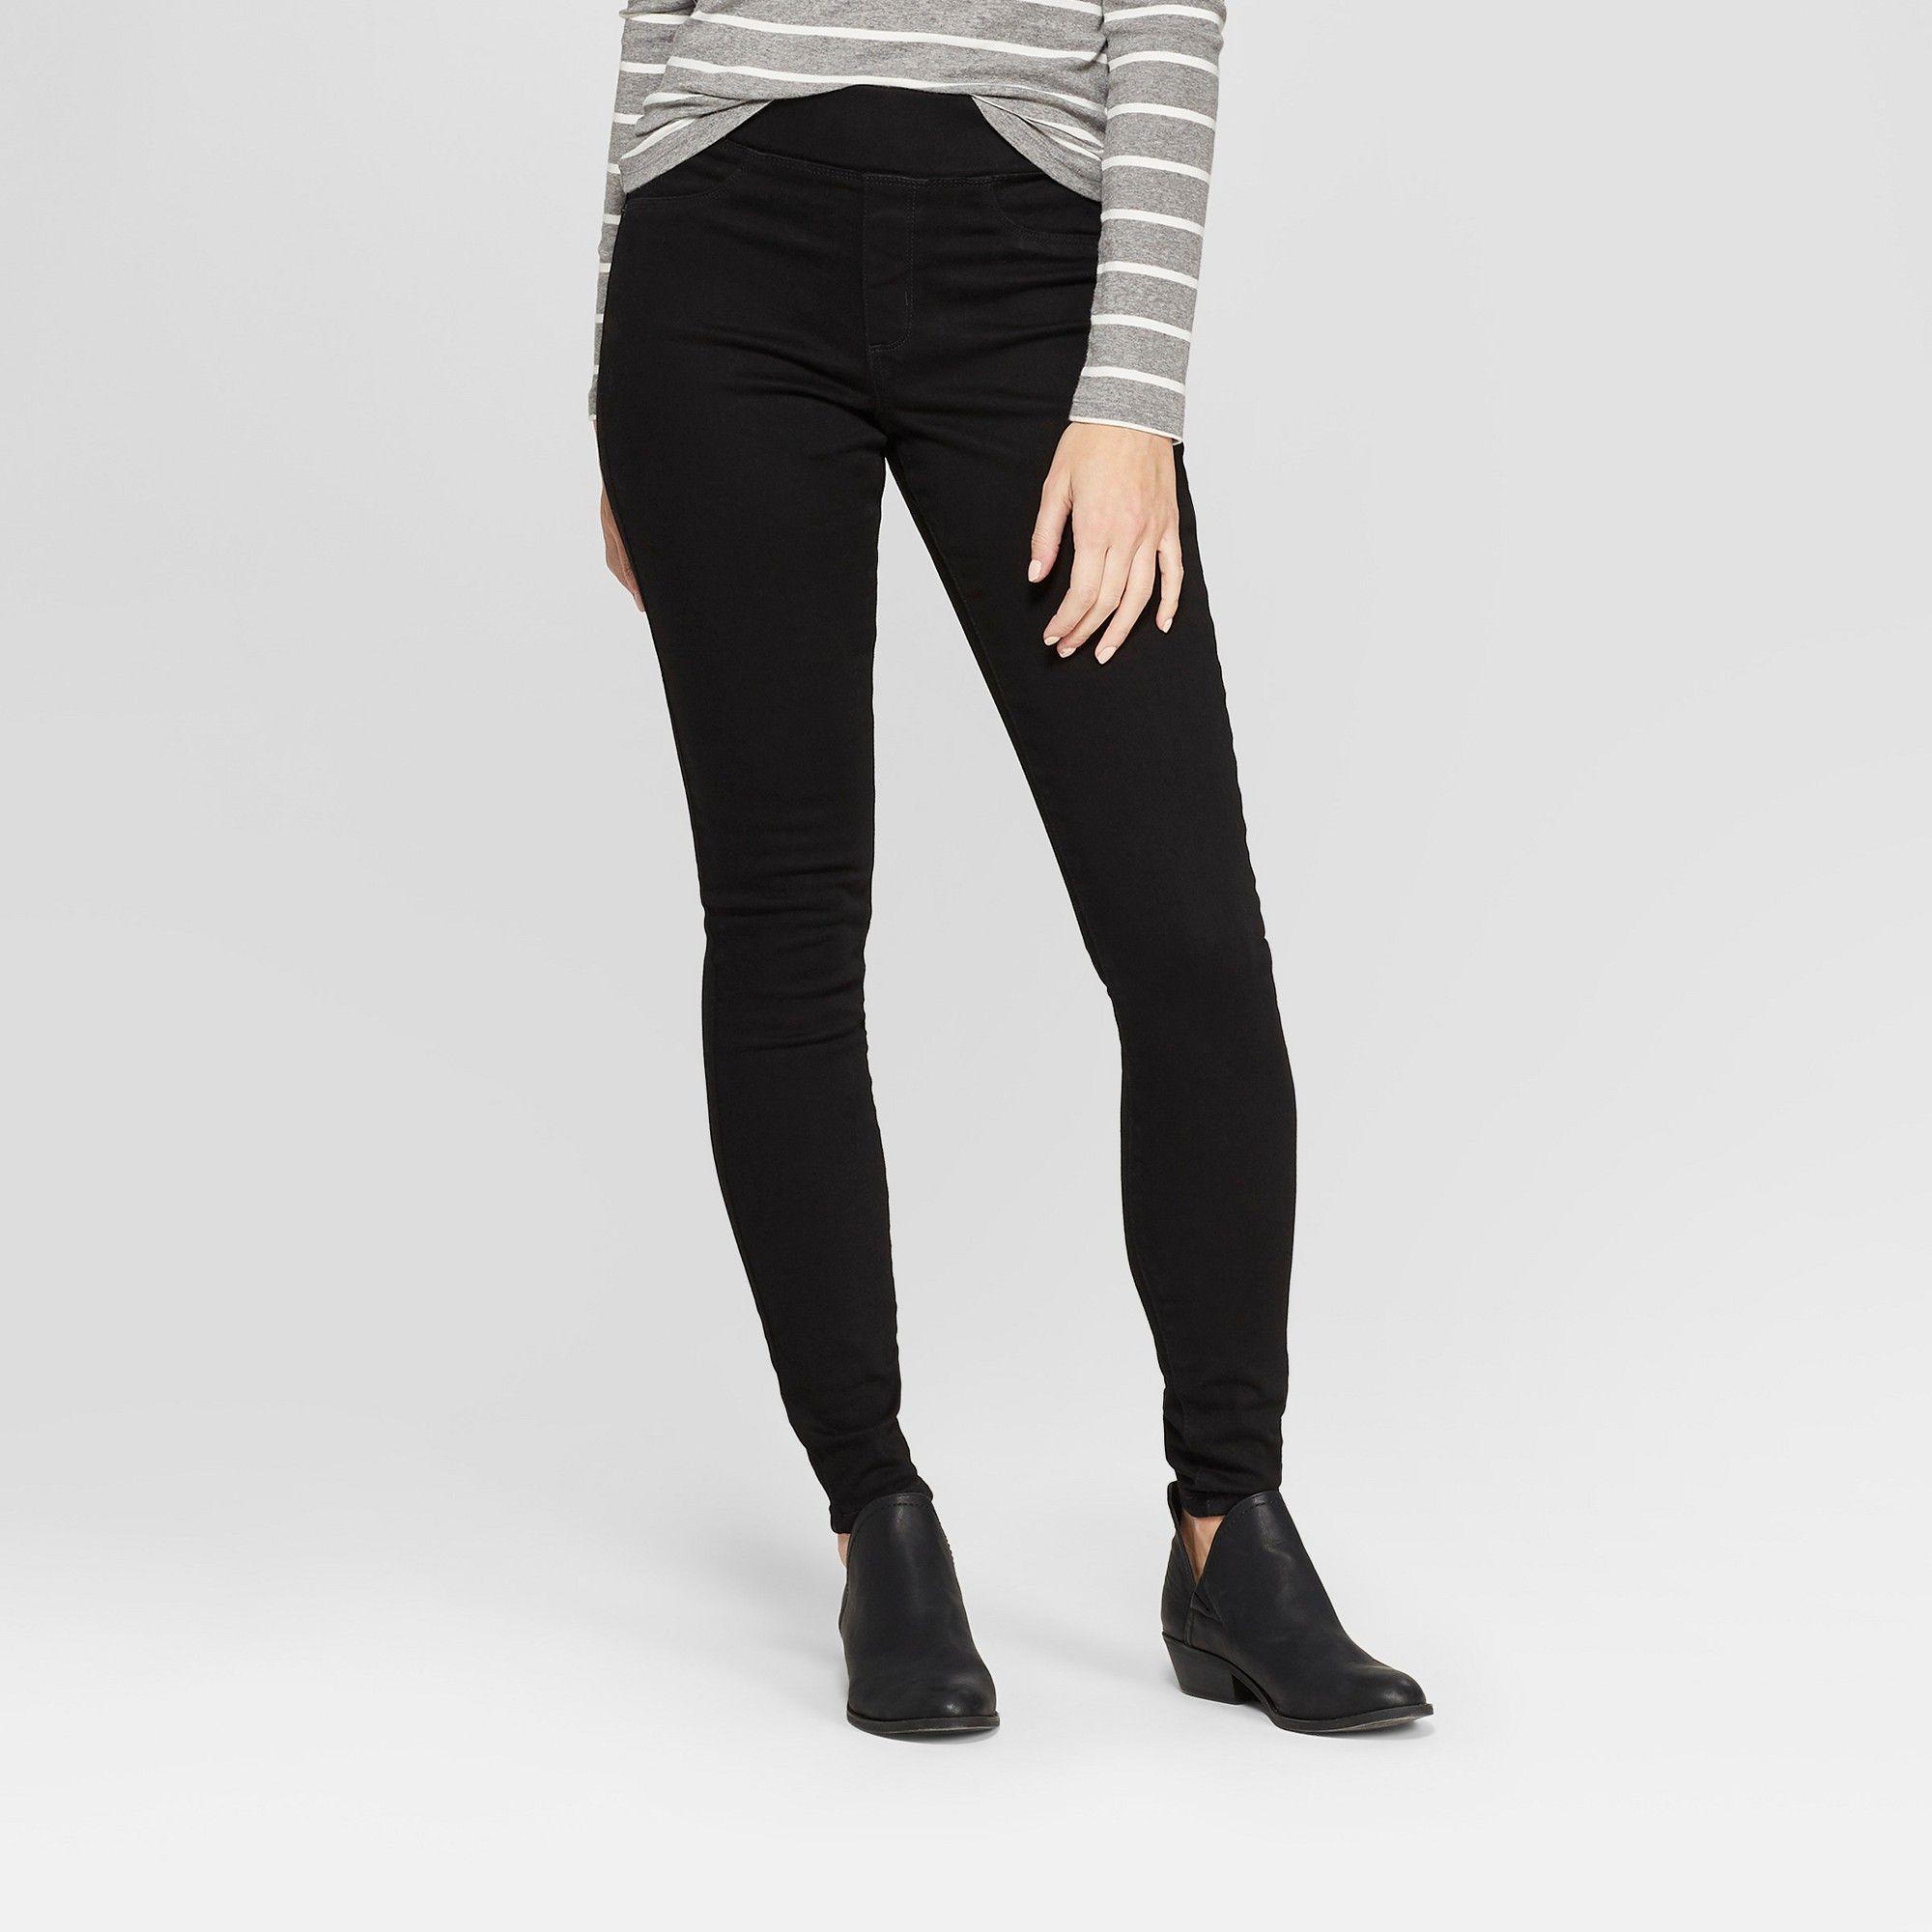 26106be315f8 Women's High-Rise Pull On Jeggings - Universal Thread Black 18 Short ...